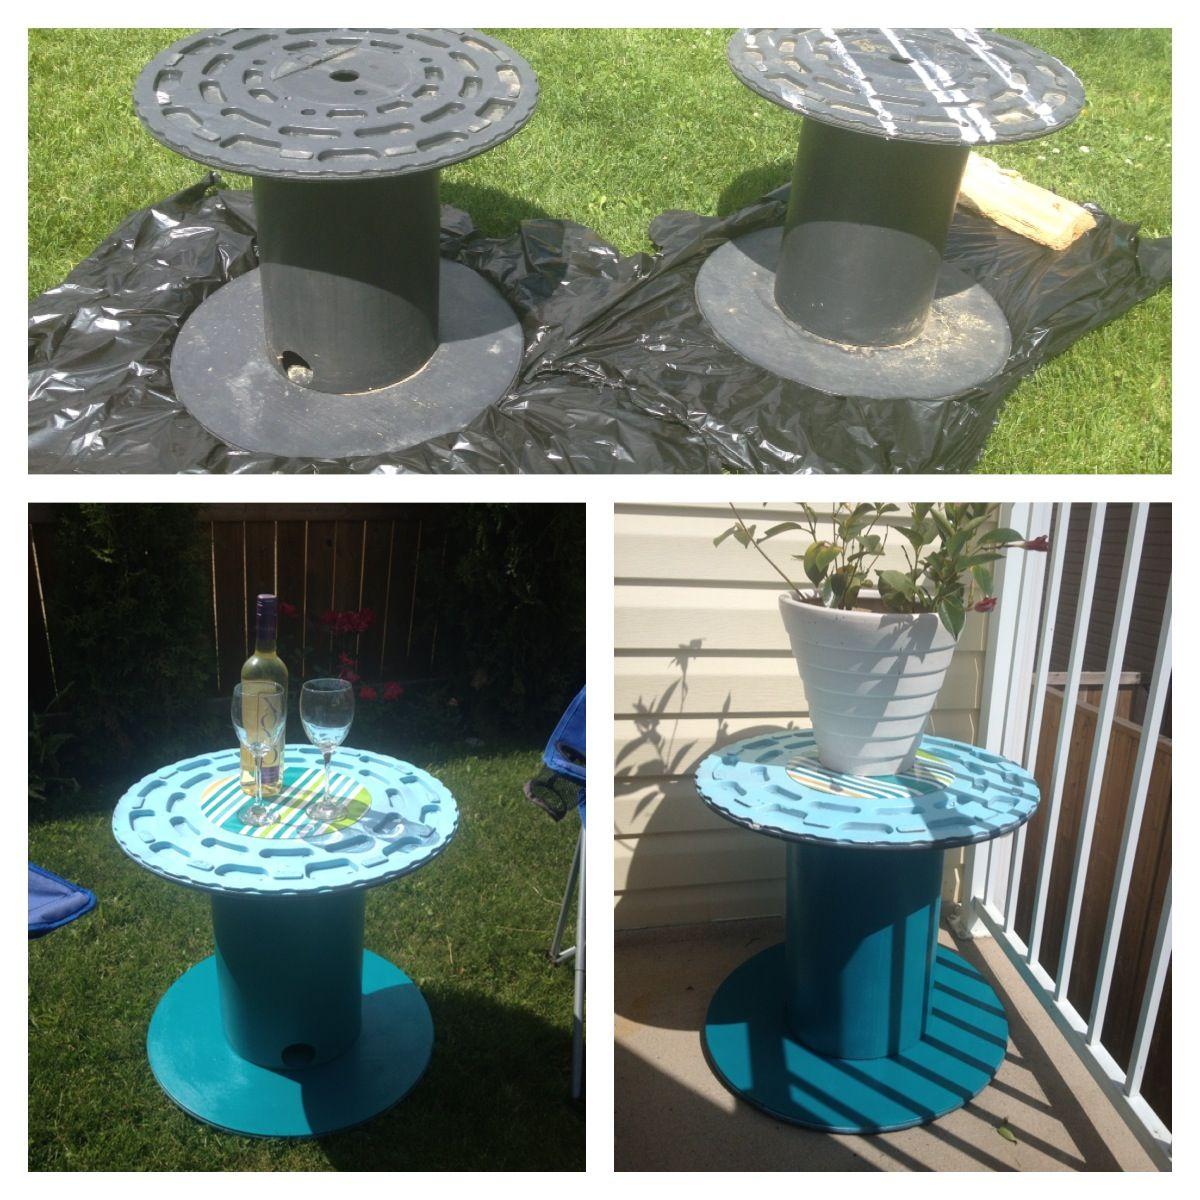 plastic cable spools free spray paint 4 plastic place mats 2